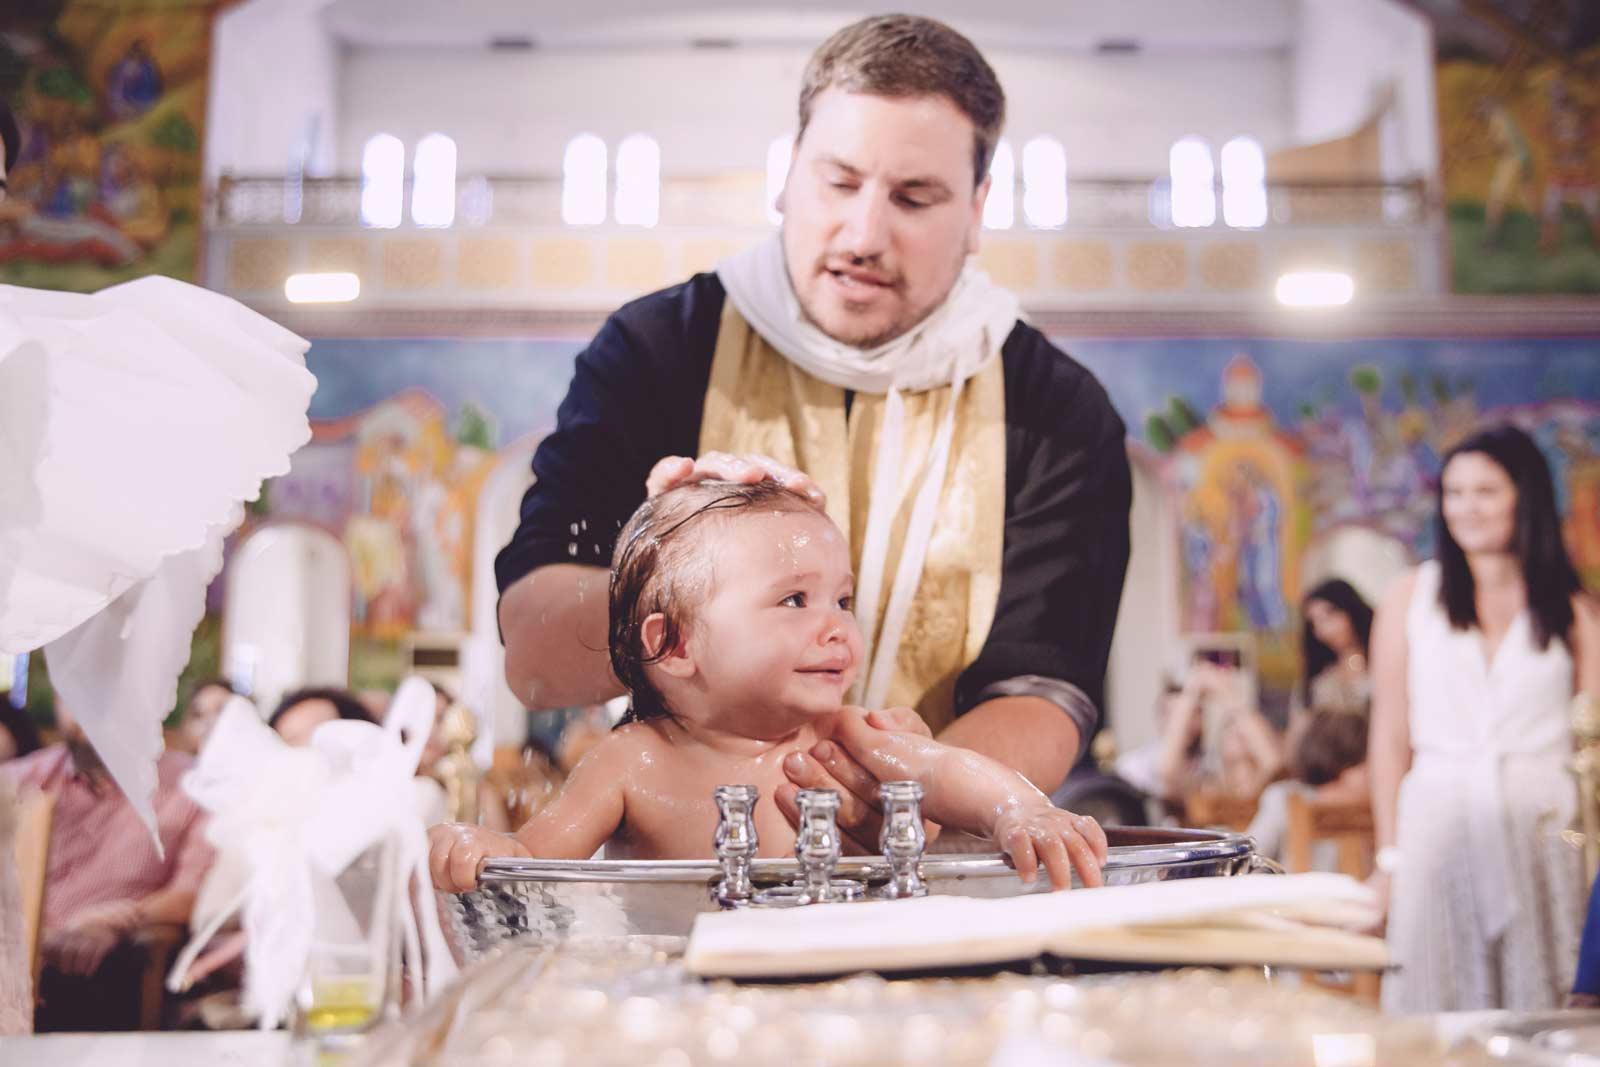 297 PhotoVaptisis βαπτιση βουλα αγιος νεκταριος vaptisi fotografos moro mama nona 016 PhotoVaptisis